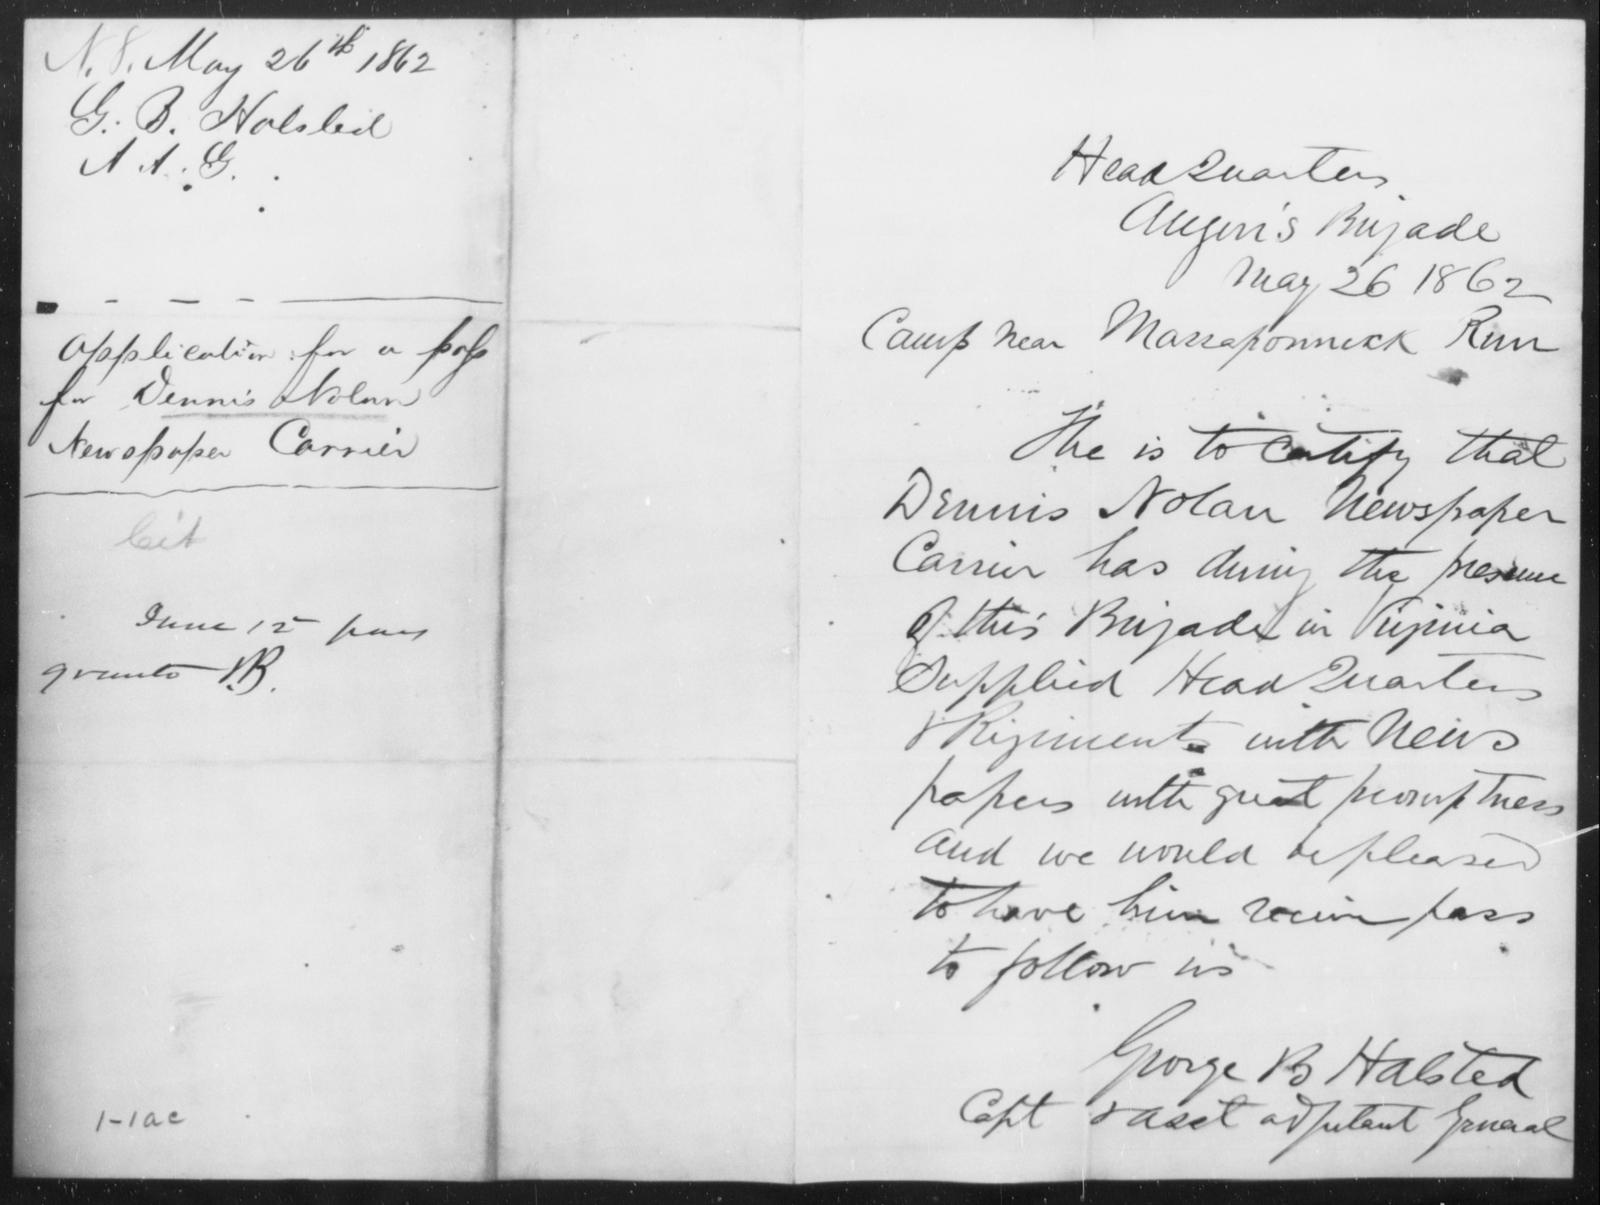 Nolan, Dennis - State: [Blank] - Year: 1862